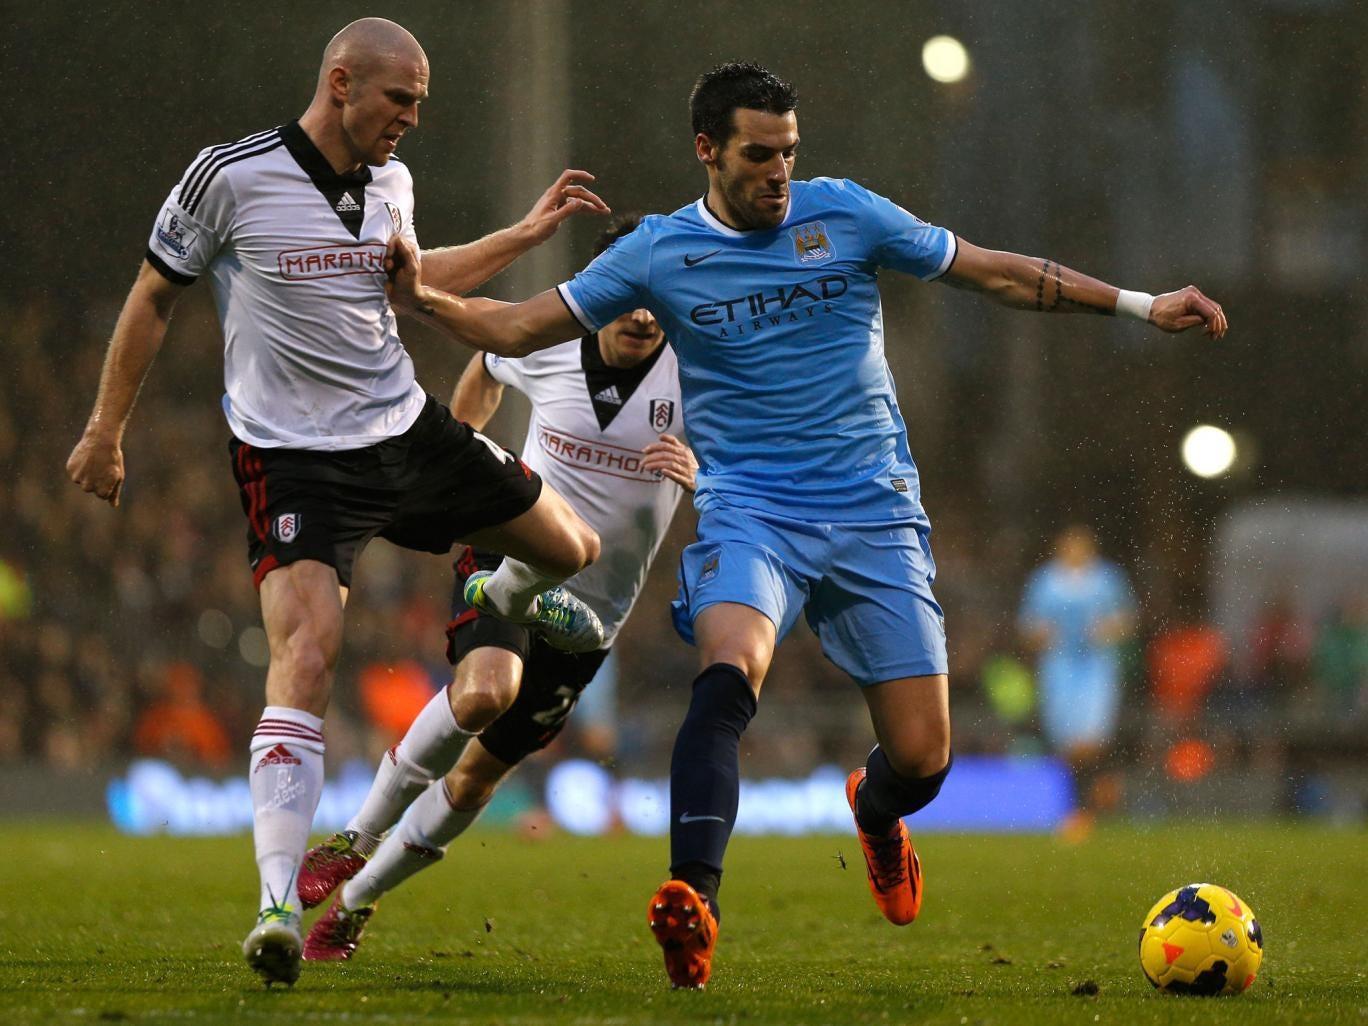 Alvaro Negredo (R) tries to hold off Fulham's Swiss defender Philippe Senderos